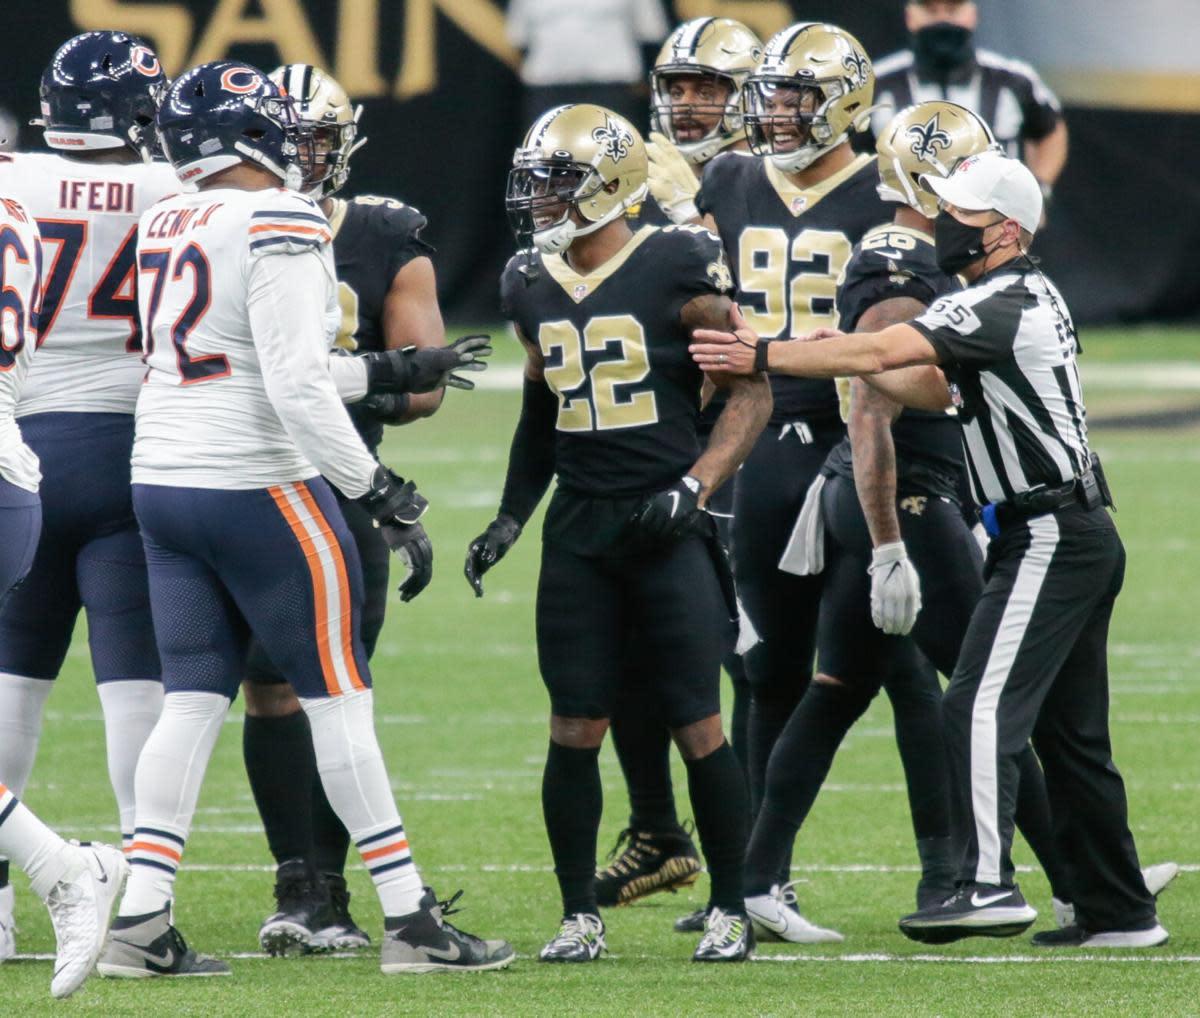 New Orleans Saints defensive back Chauncey Gardner-Johnson (22). Credit: Nola.com